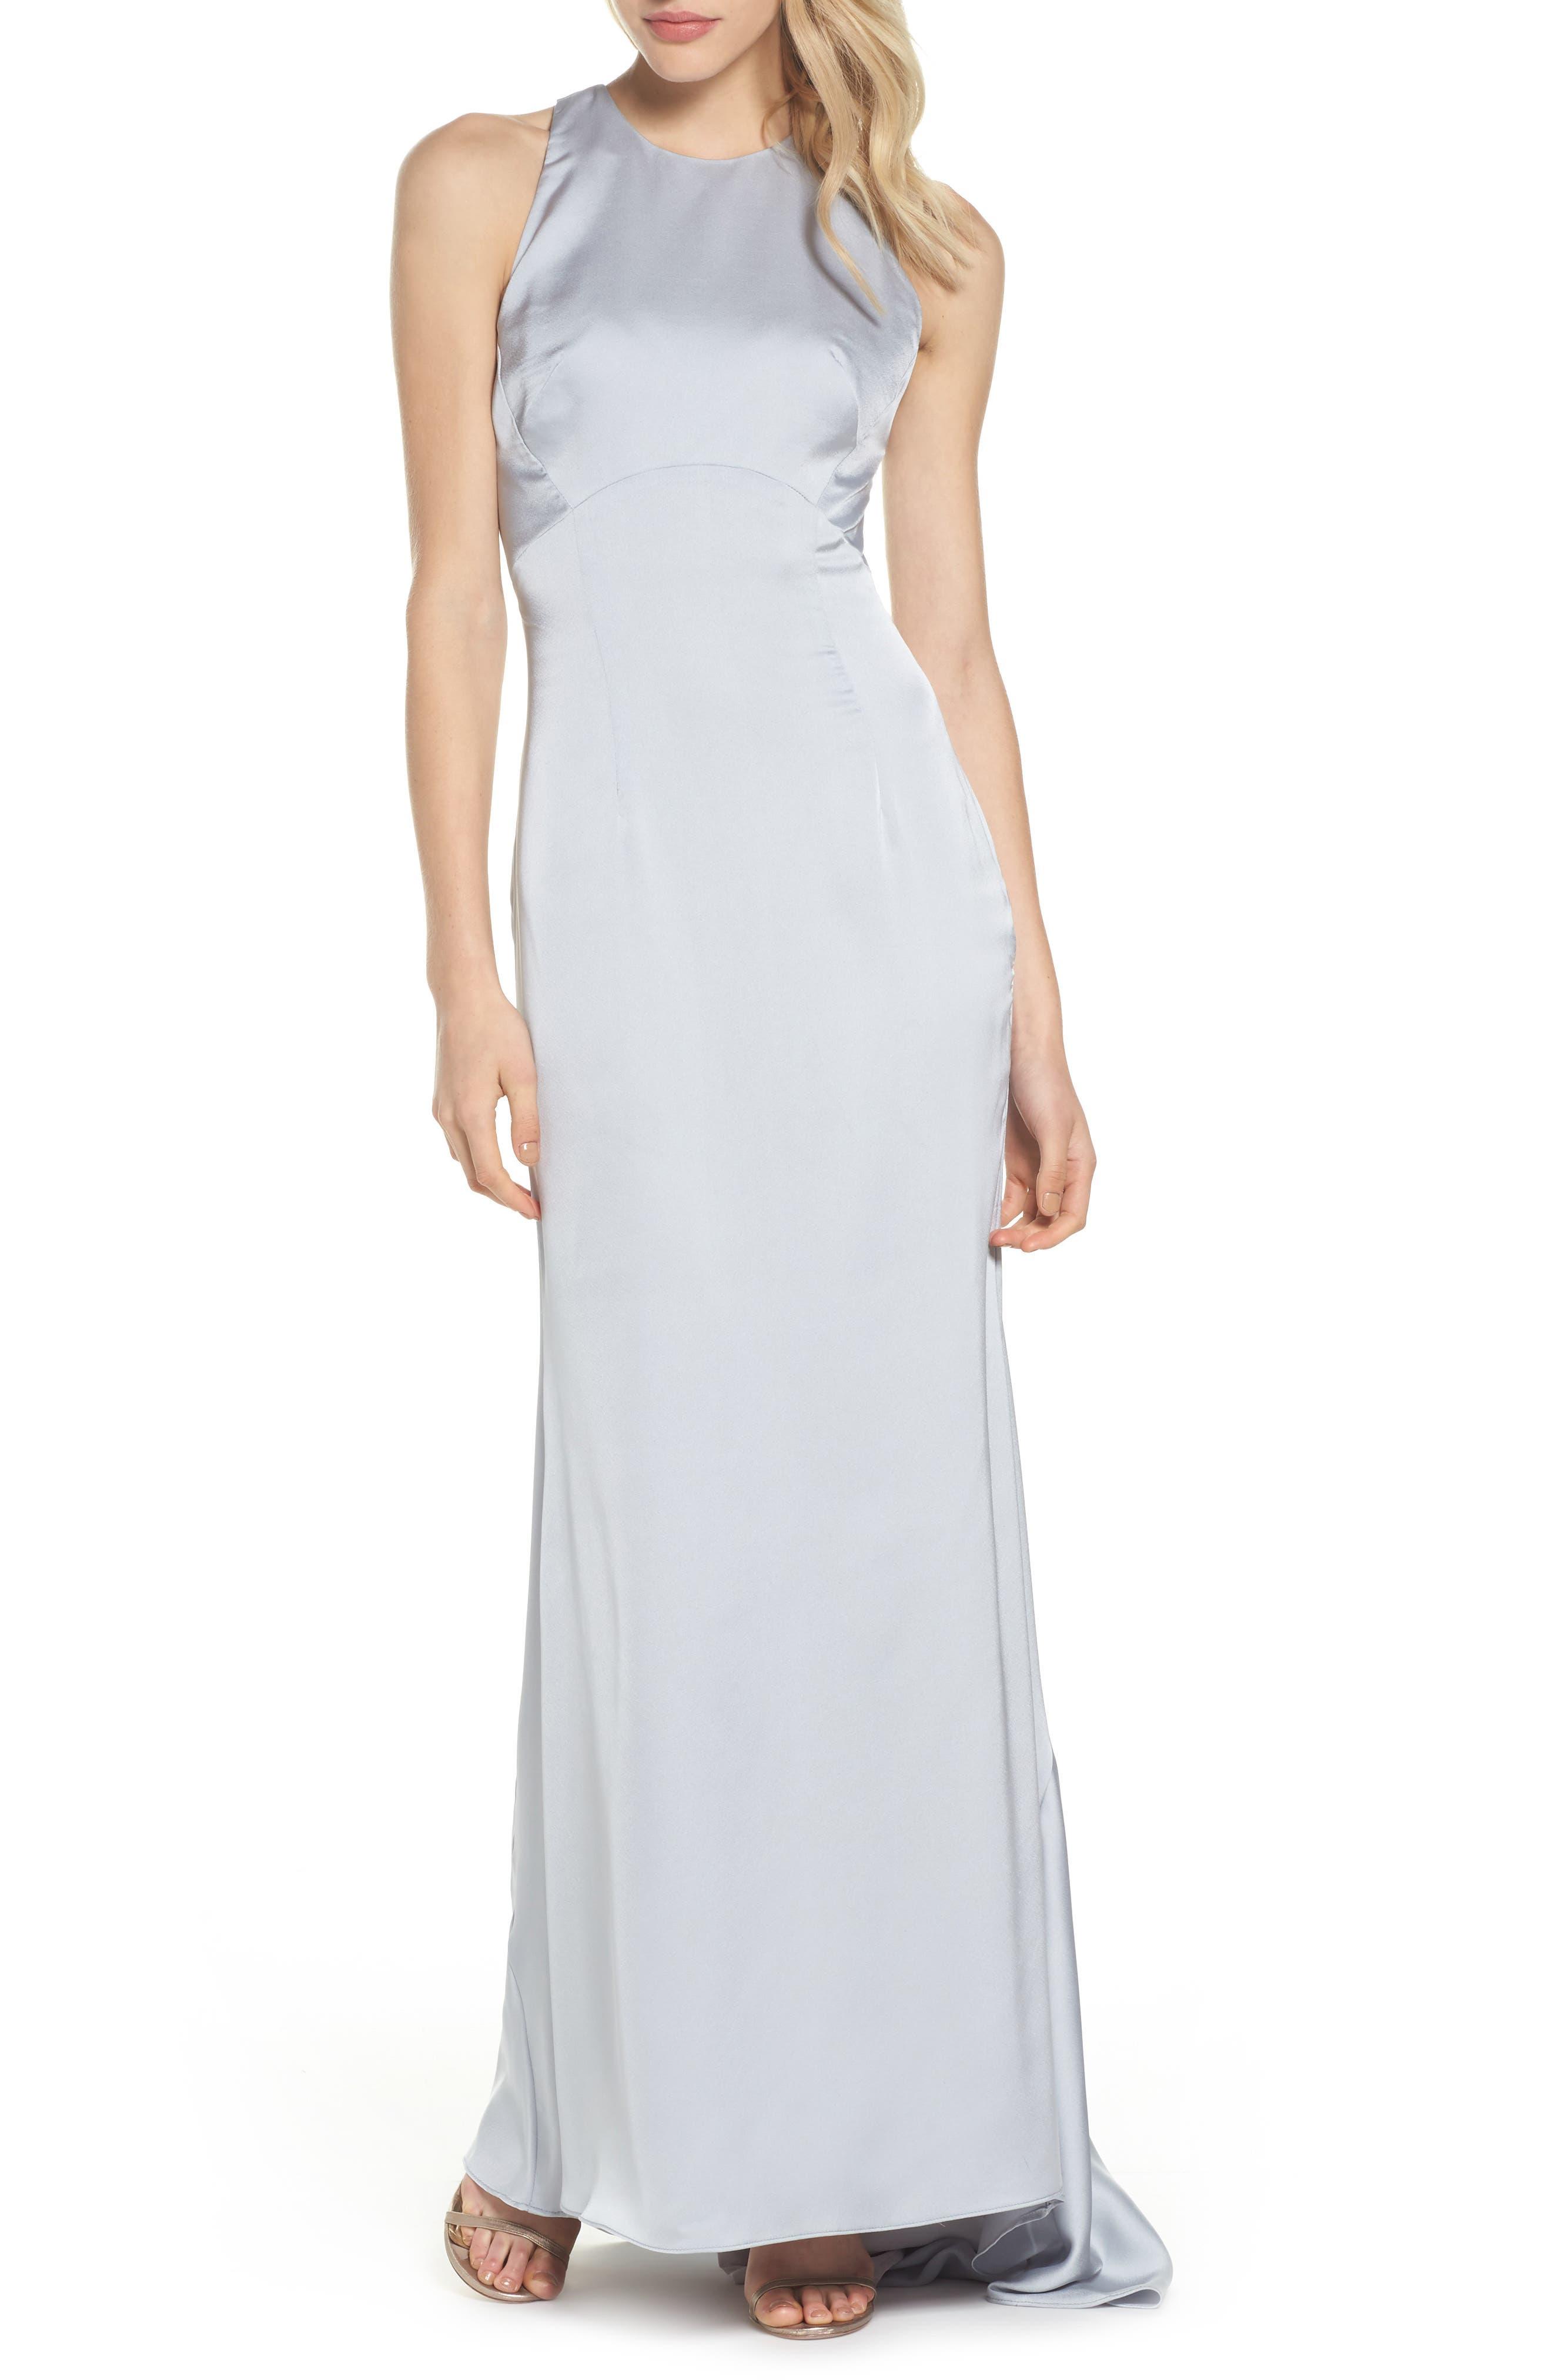 Amara Cross Back Satin Gown,                         Main,                         color, 044